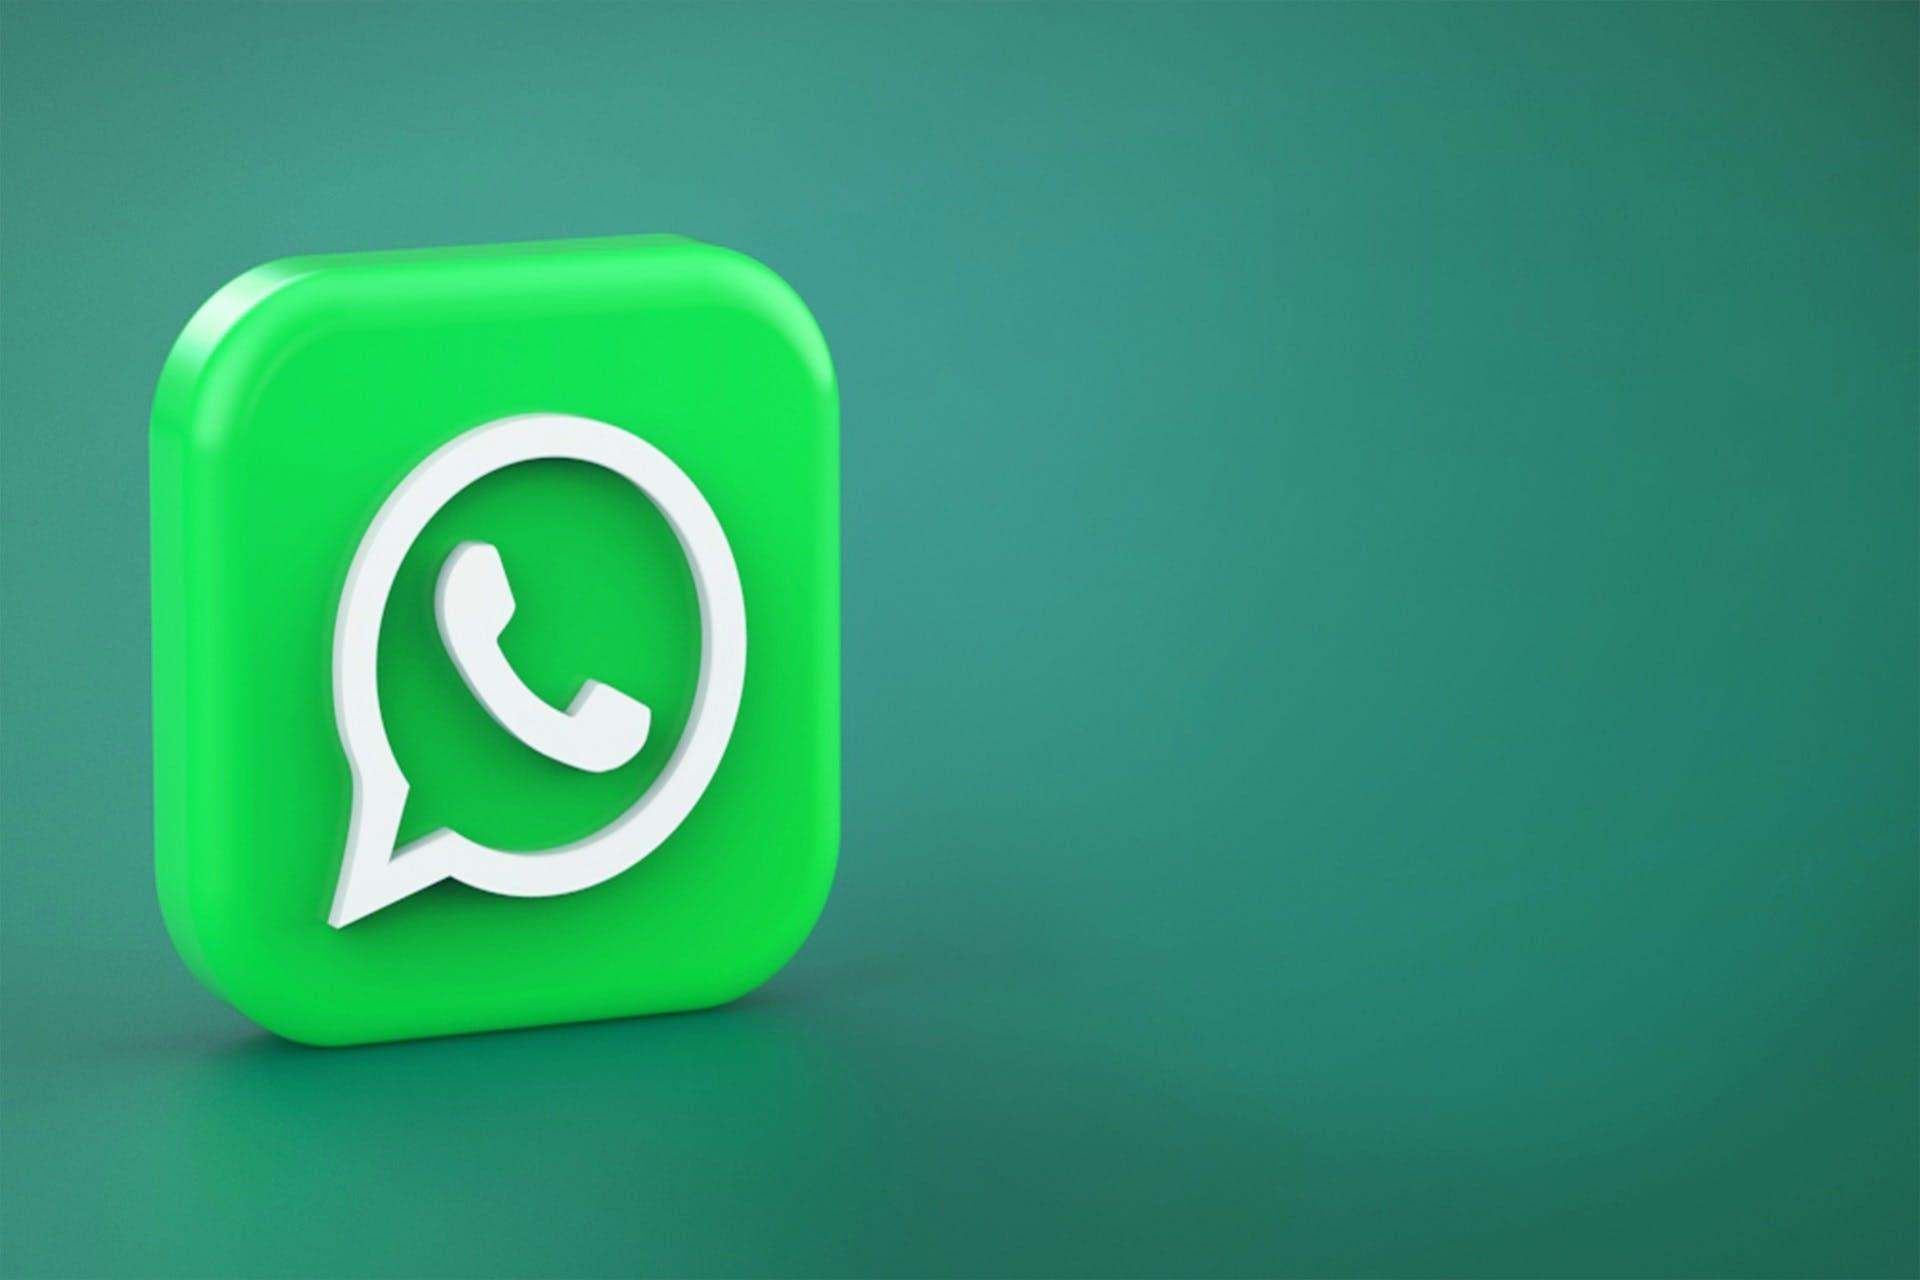 WhatsApp logo used for marketing